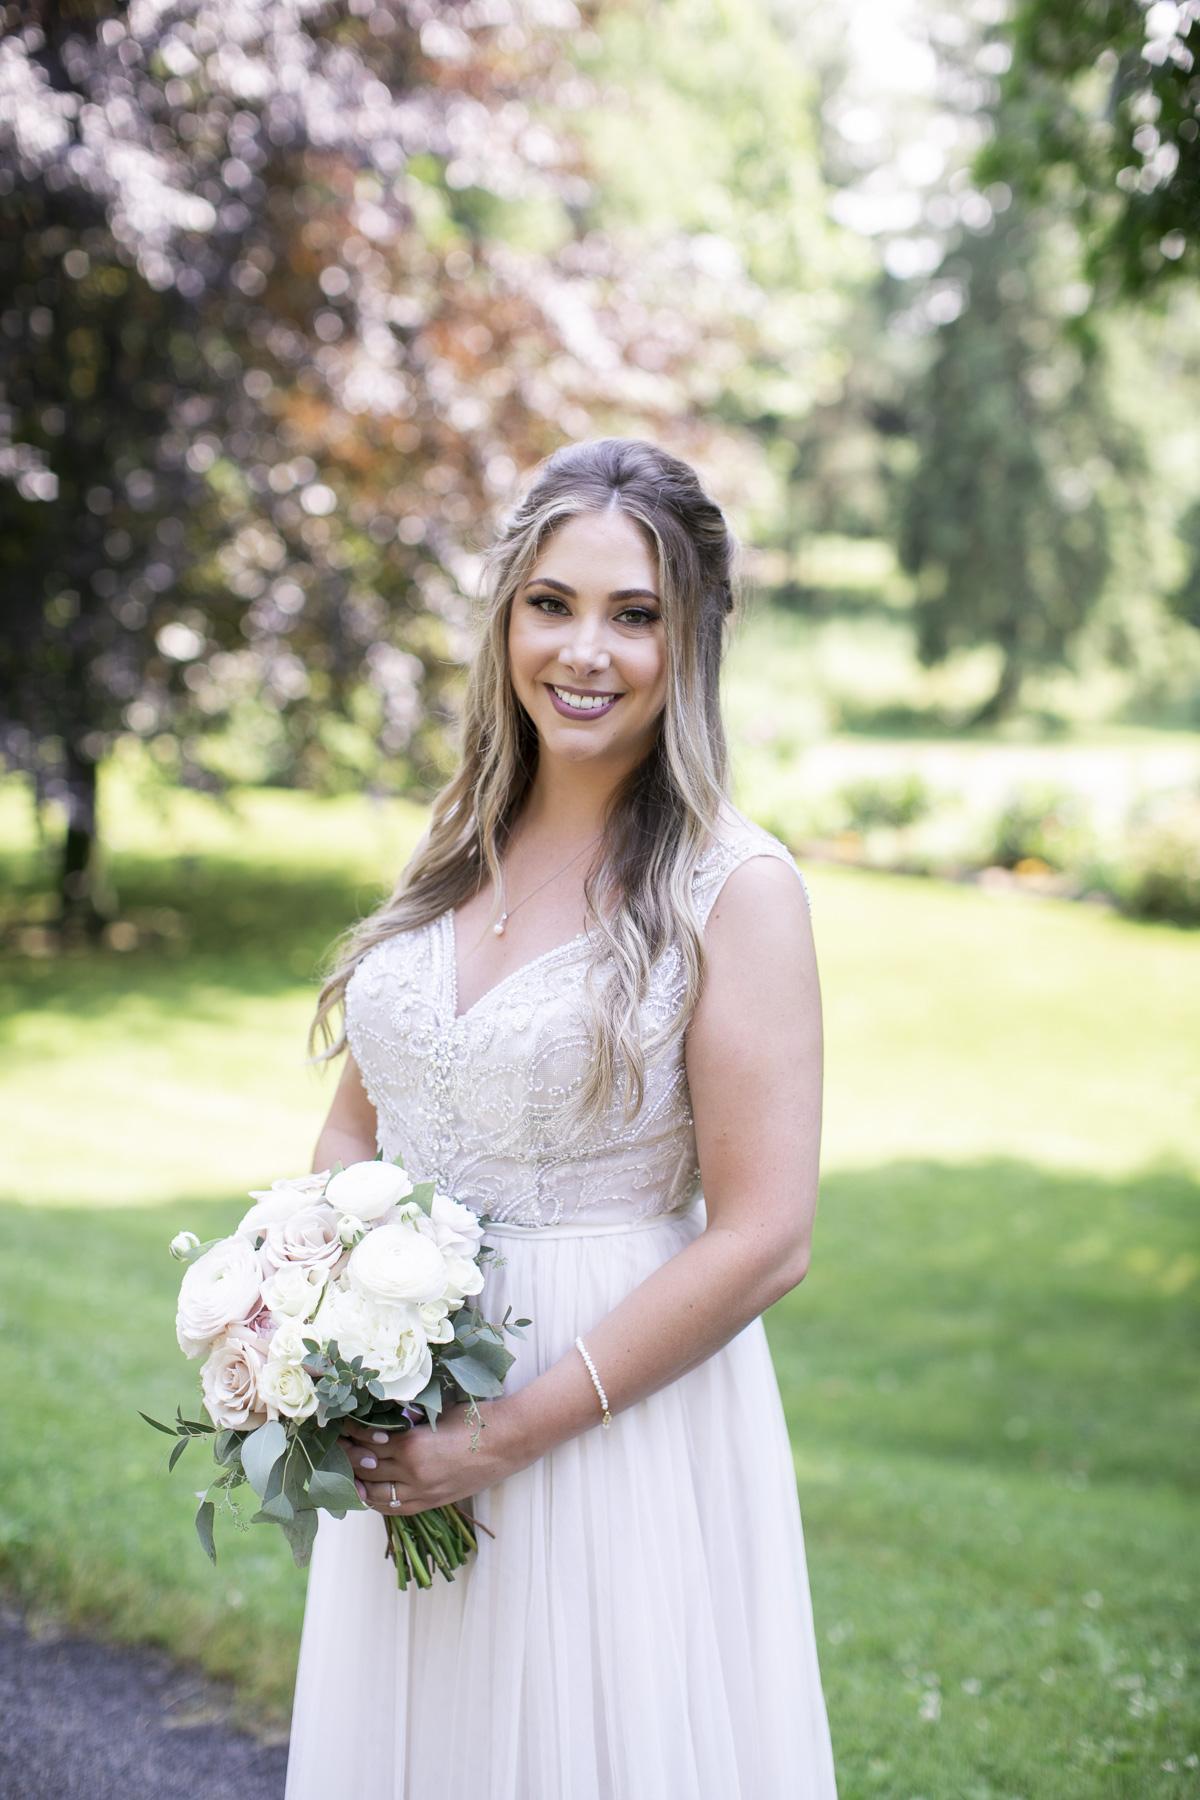 vineyard-bride-philosophy-studios-outdoor-summer-wedding-the-tamahaac-club-niagara-ancaster-toronto-vendor-0051.JPG